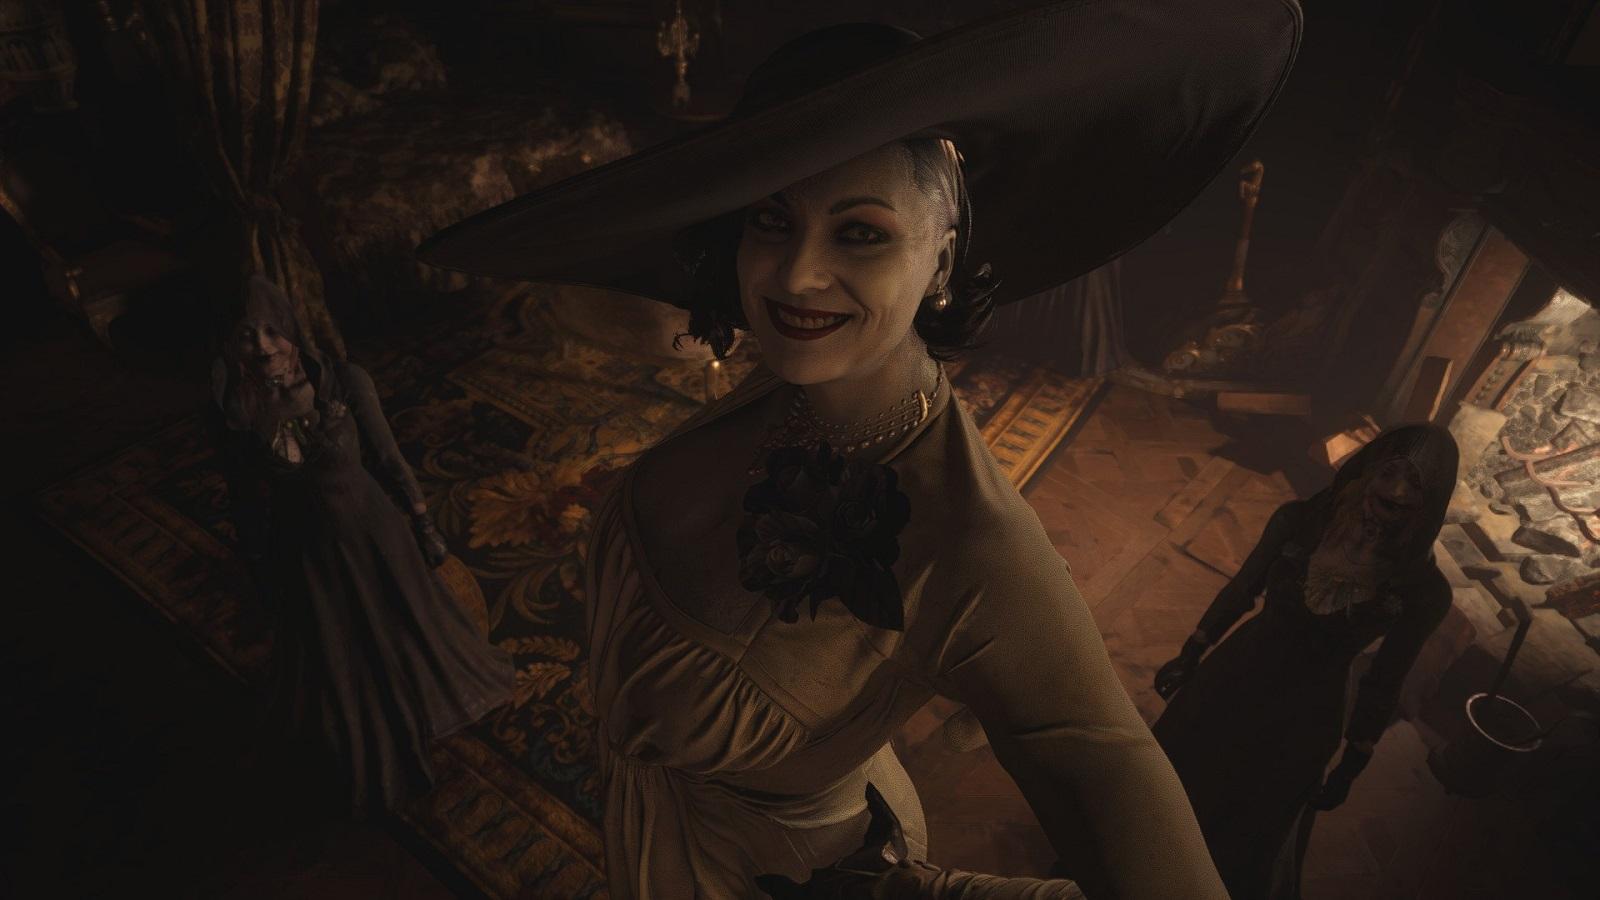 Steam-версия Resident Evil Village привлекла на запуске более 100 тыс. человек и превзошла рекорд серии